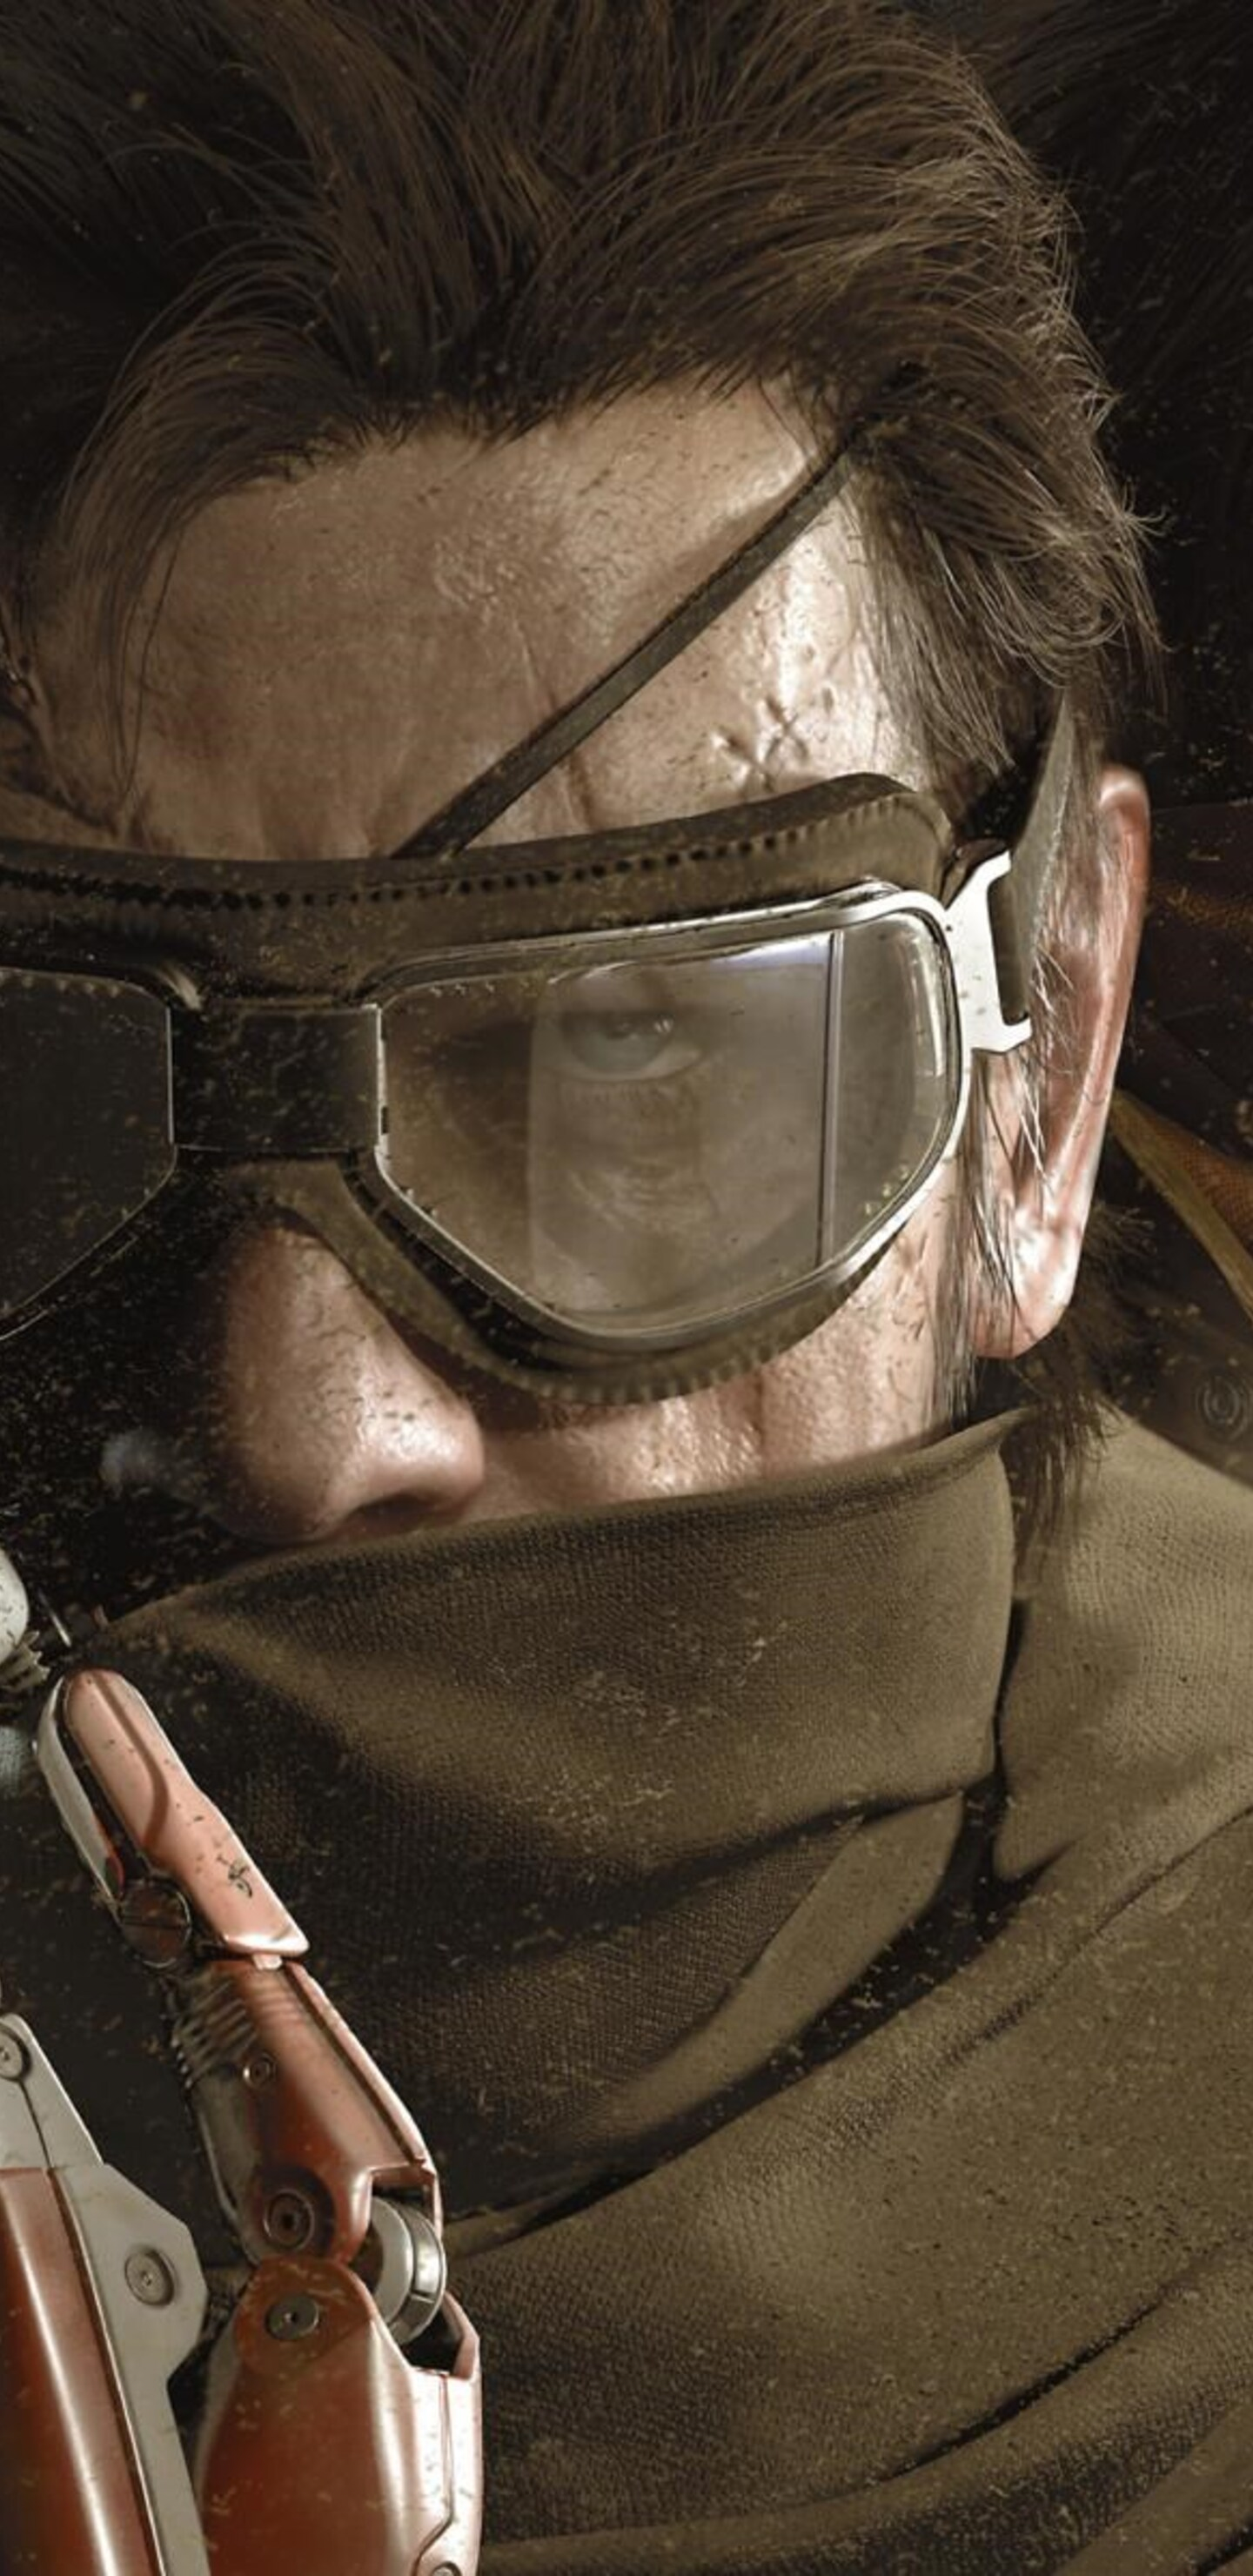 1440x2960 Metal Gear Solid V The Phantom Pain Samsung Galaxy